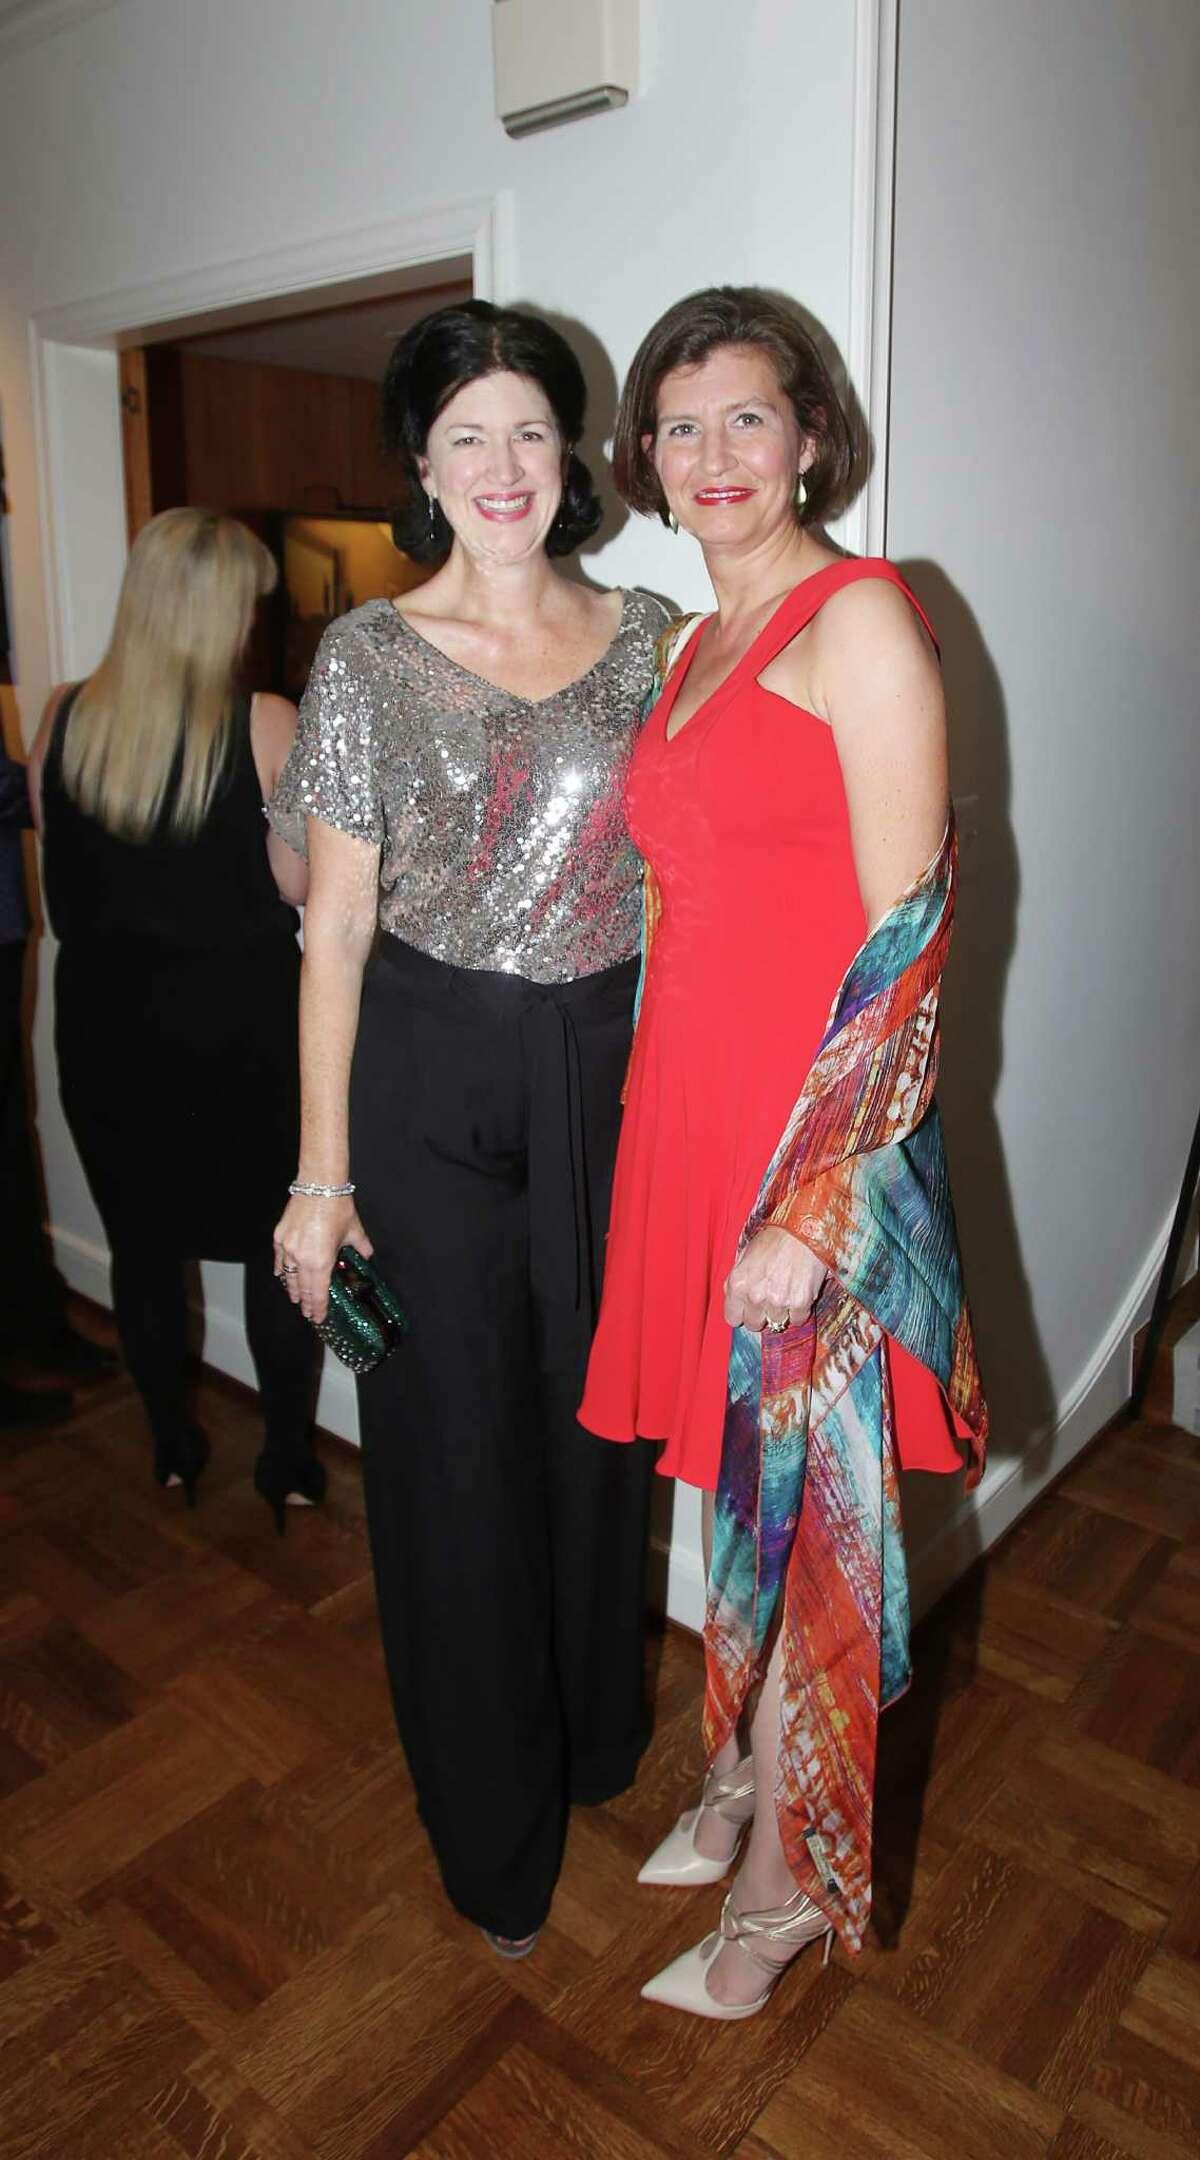 Nicola Toubia and Catherine Keen